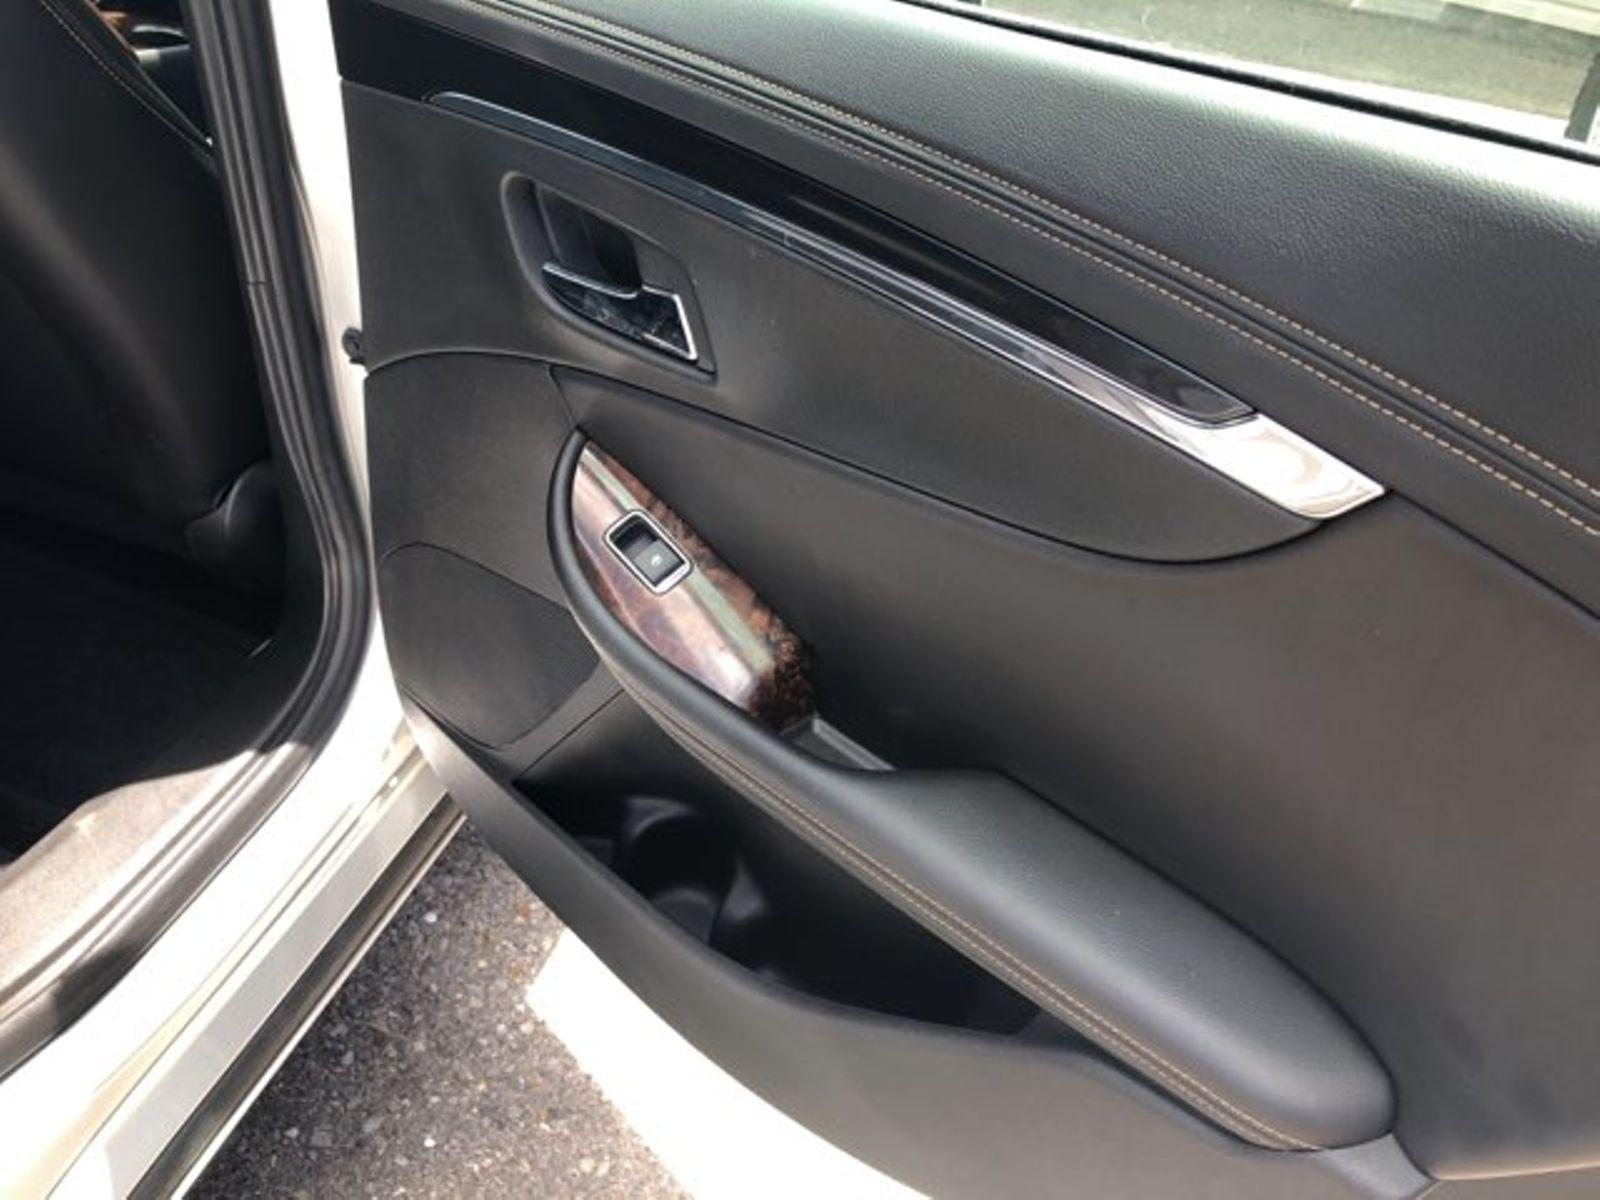 impala goes sale on cng chevrolet bifuel bi fuel auto news